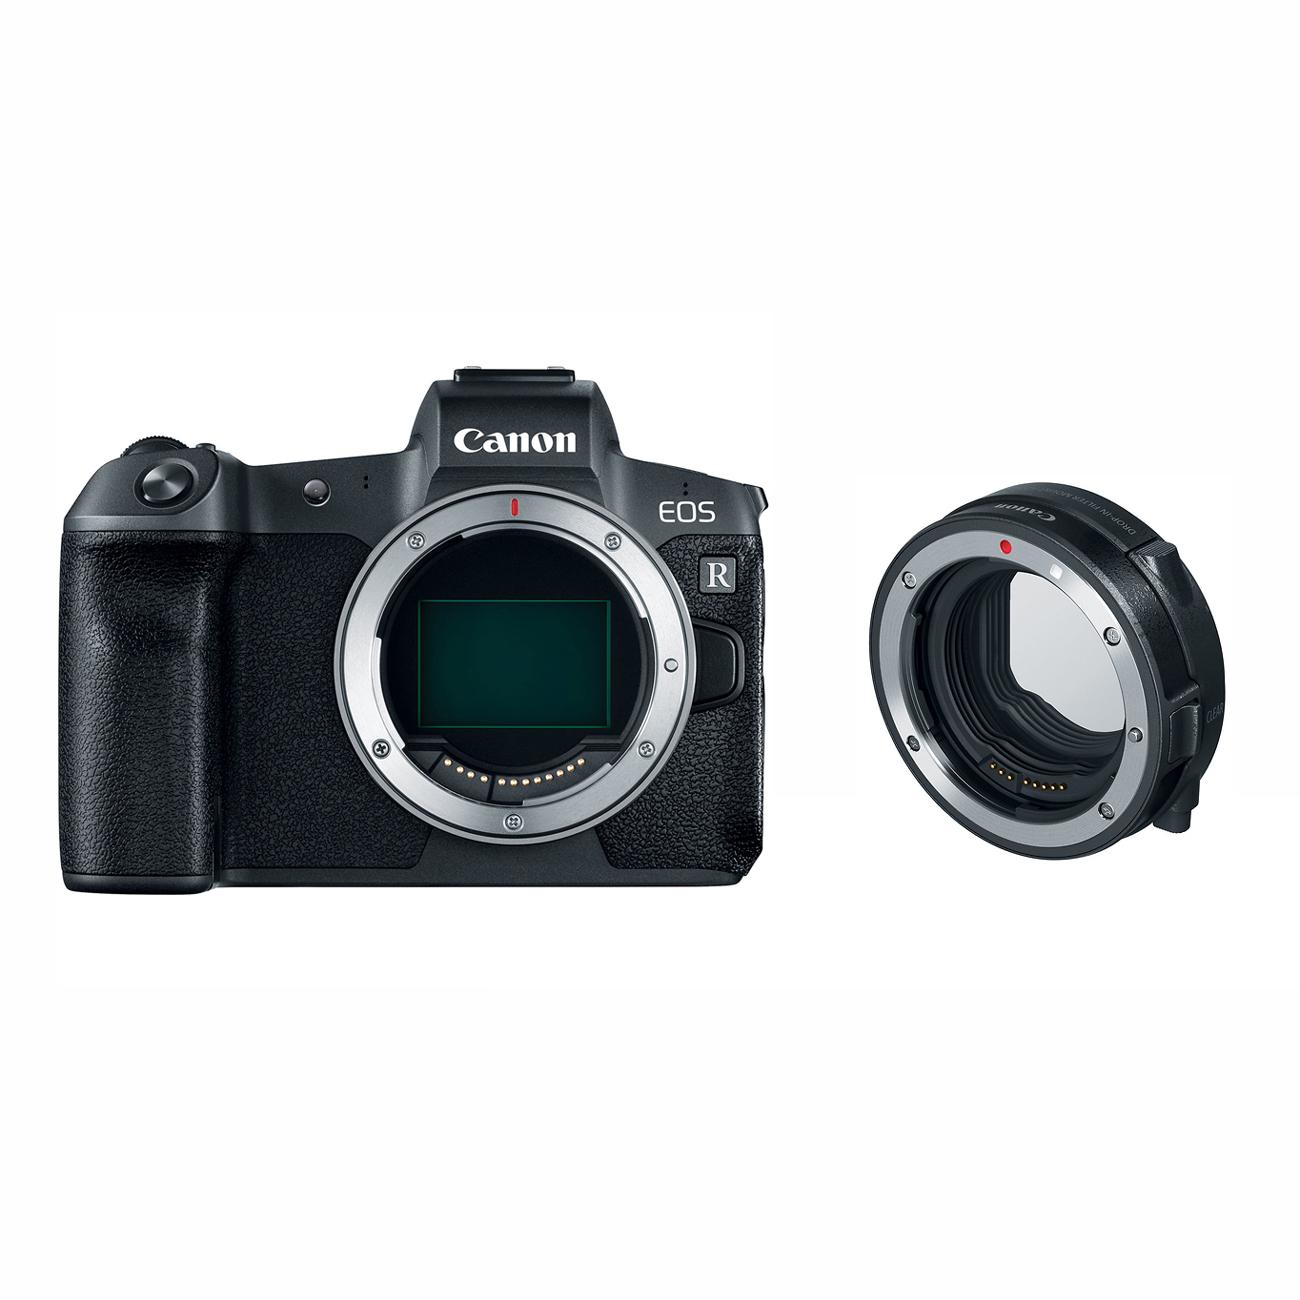 Canon R Mirrorless Digital Camera + Mount Adapter + 64GB SD Card + 1TB USB3.1 External HD + More $1399 + free s/h $1399.99